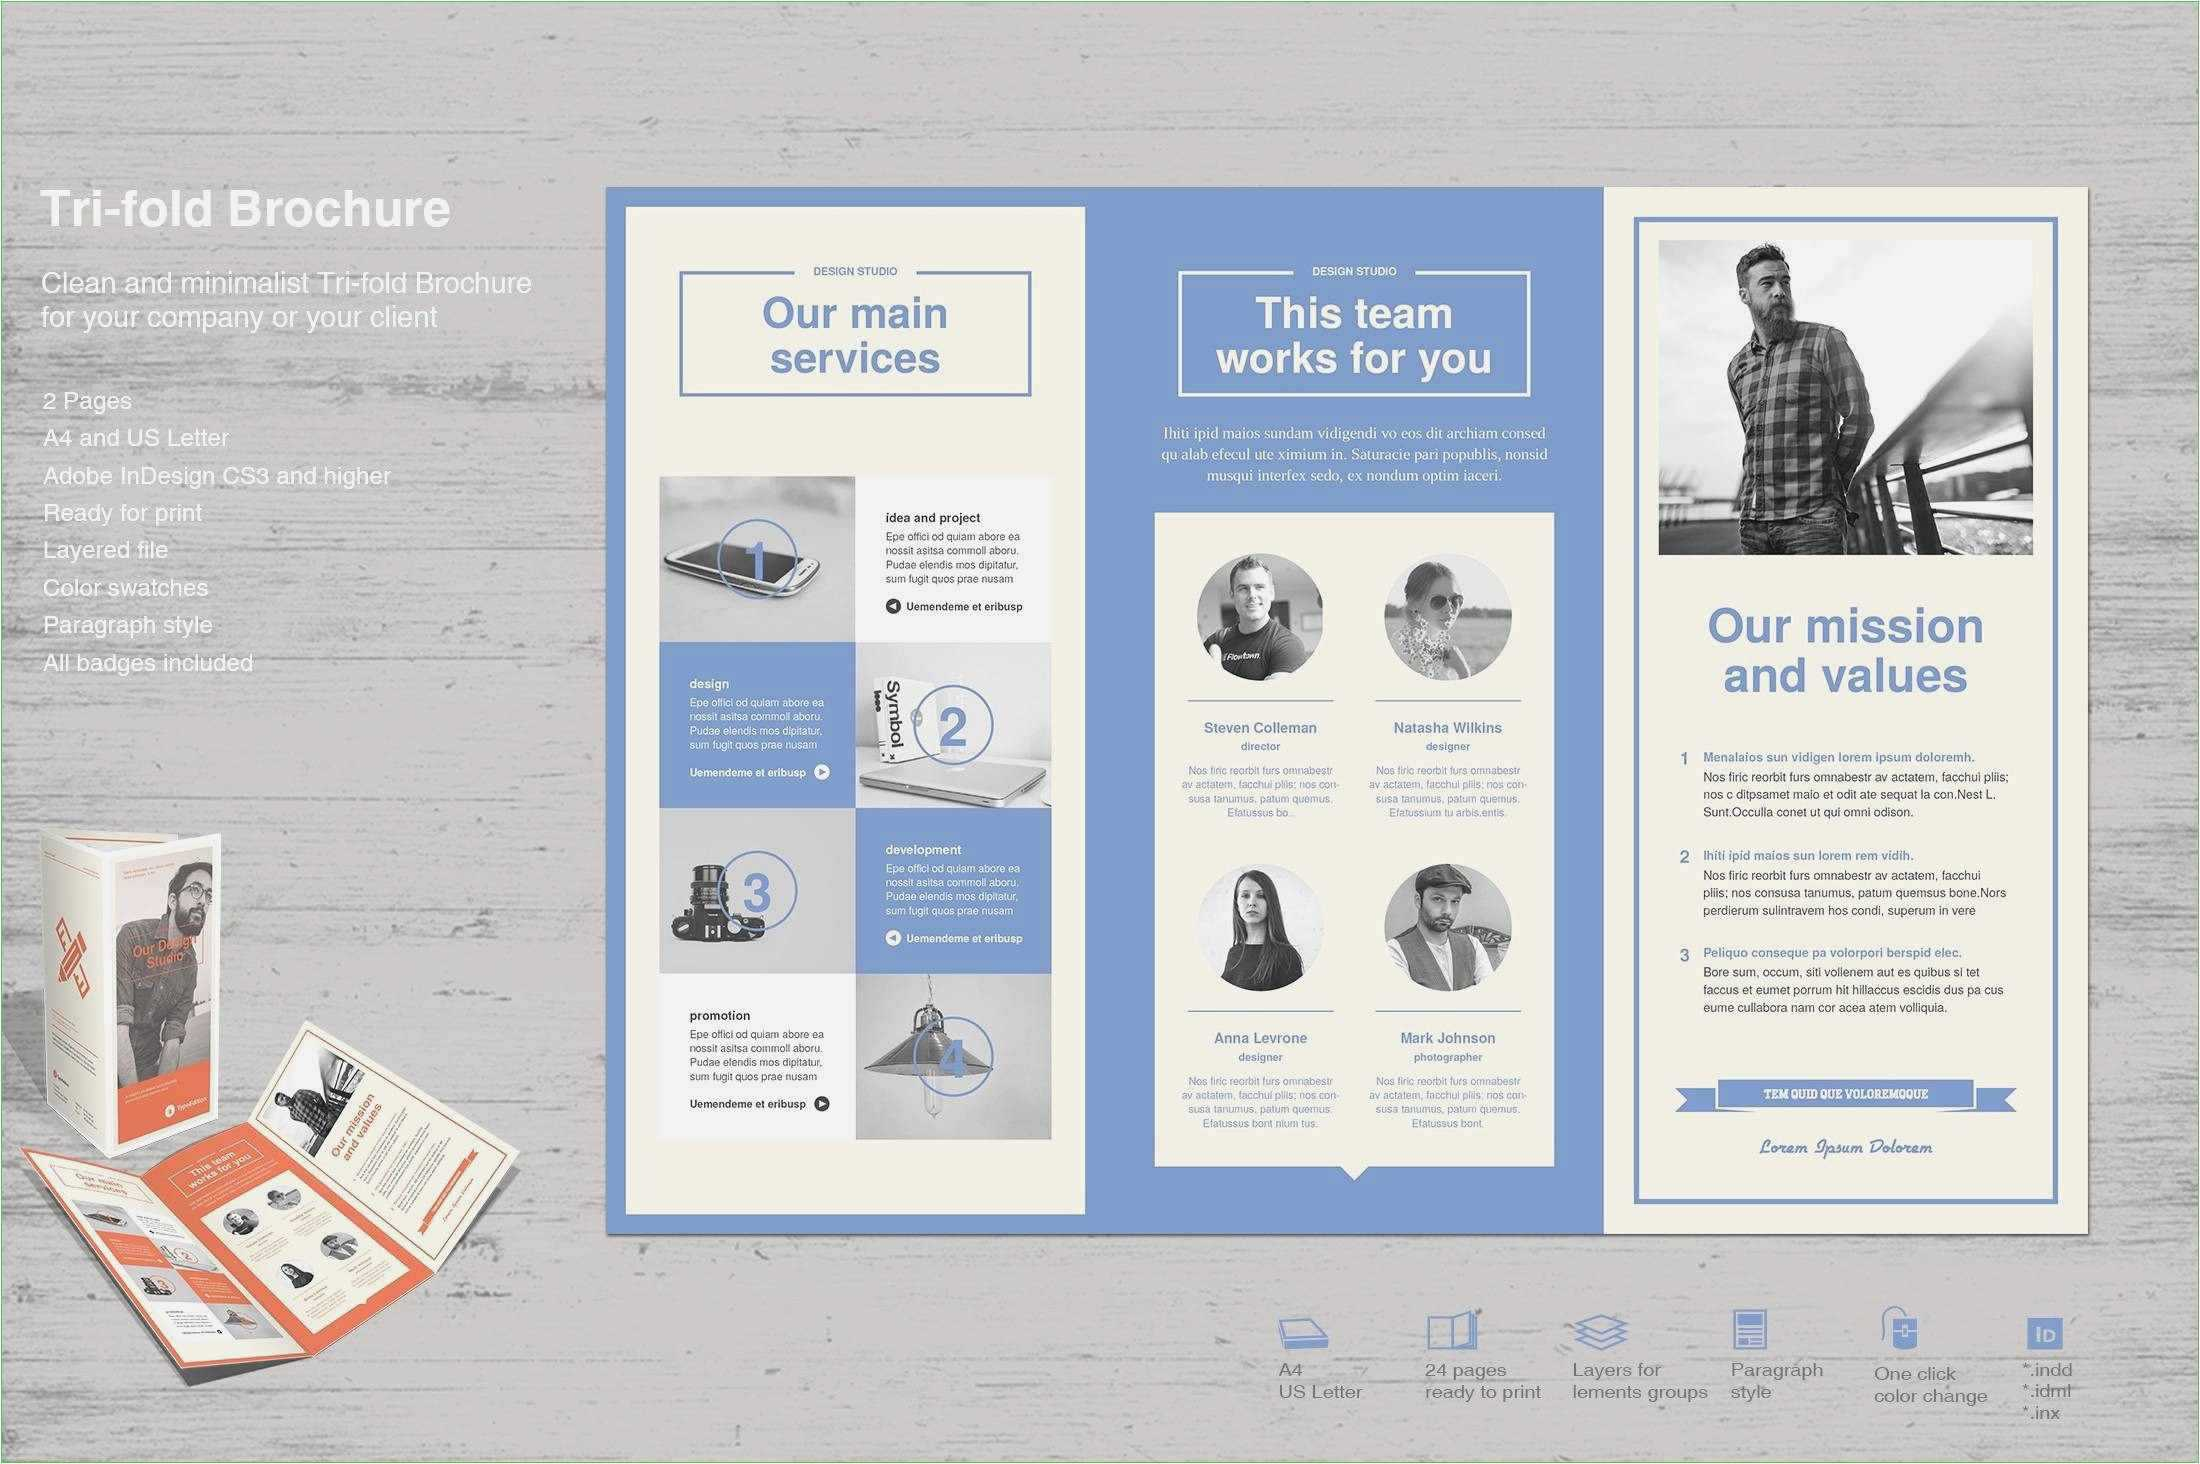 019 Template Ideas Free Blank Tri Fold Brochure Publisher For Tri Fold Brochure Publisher Template